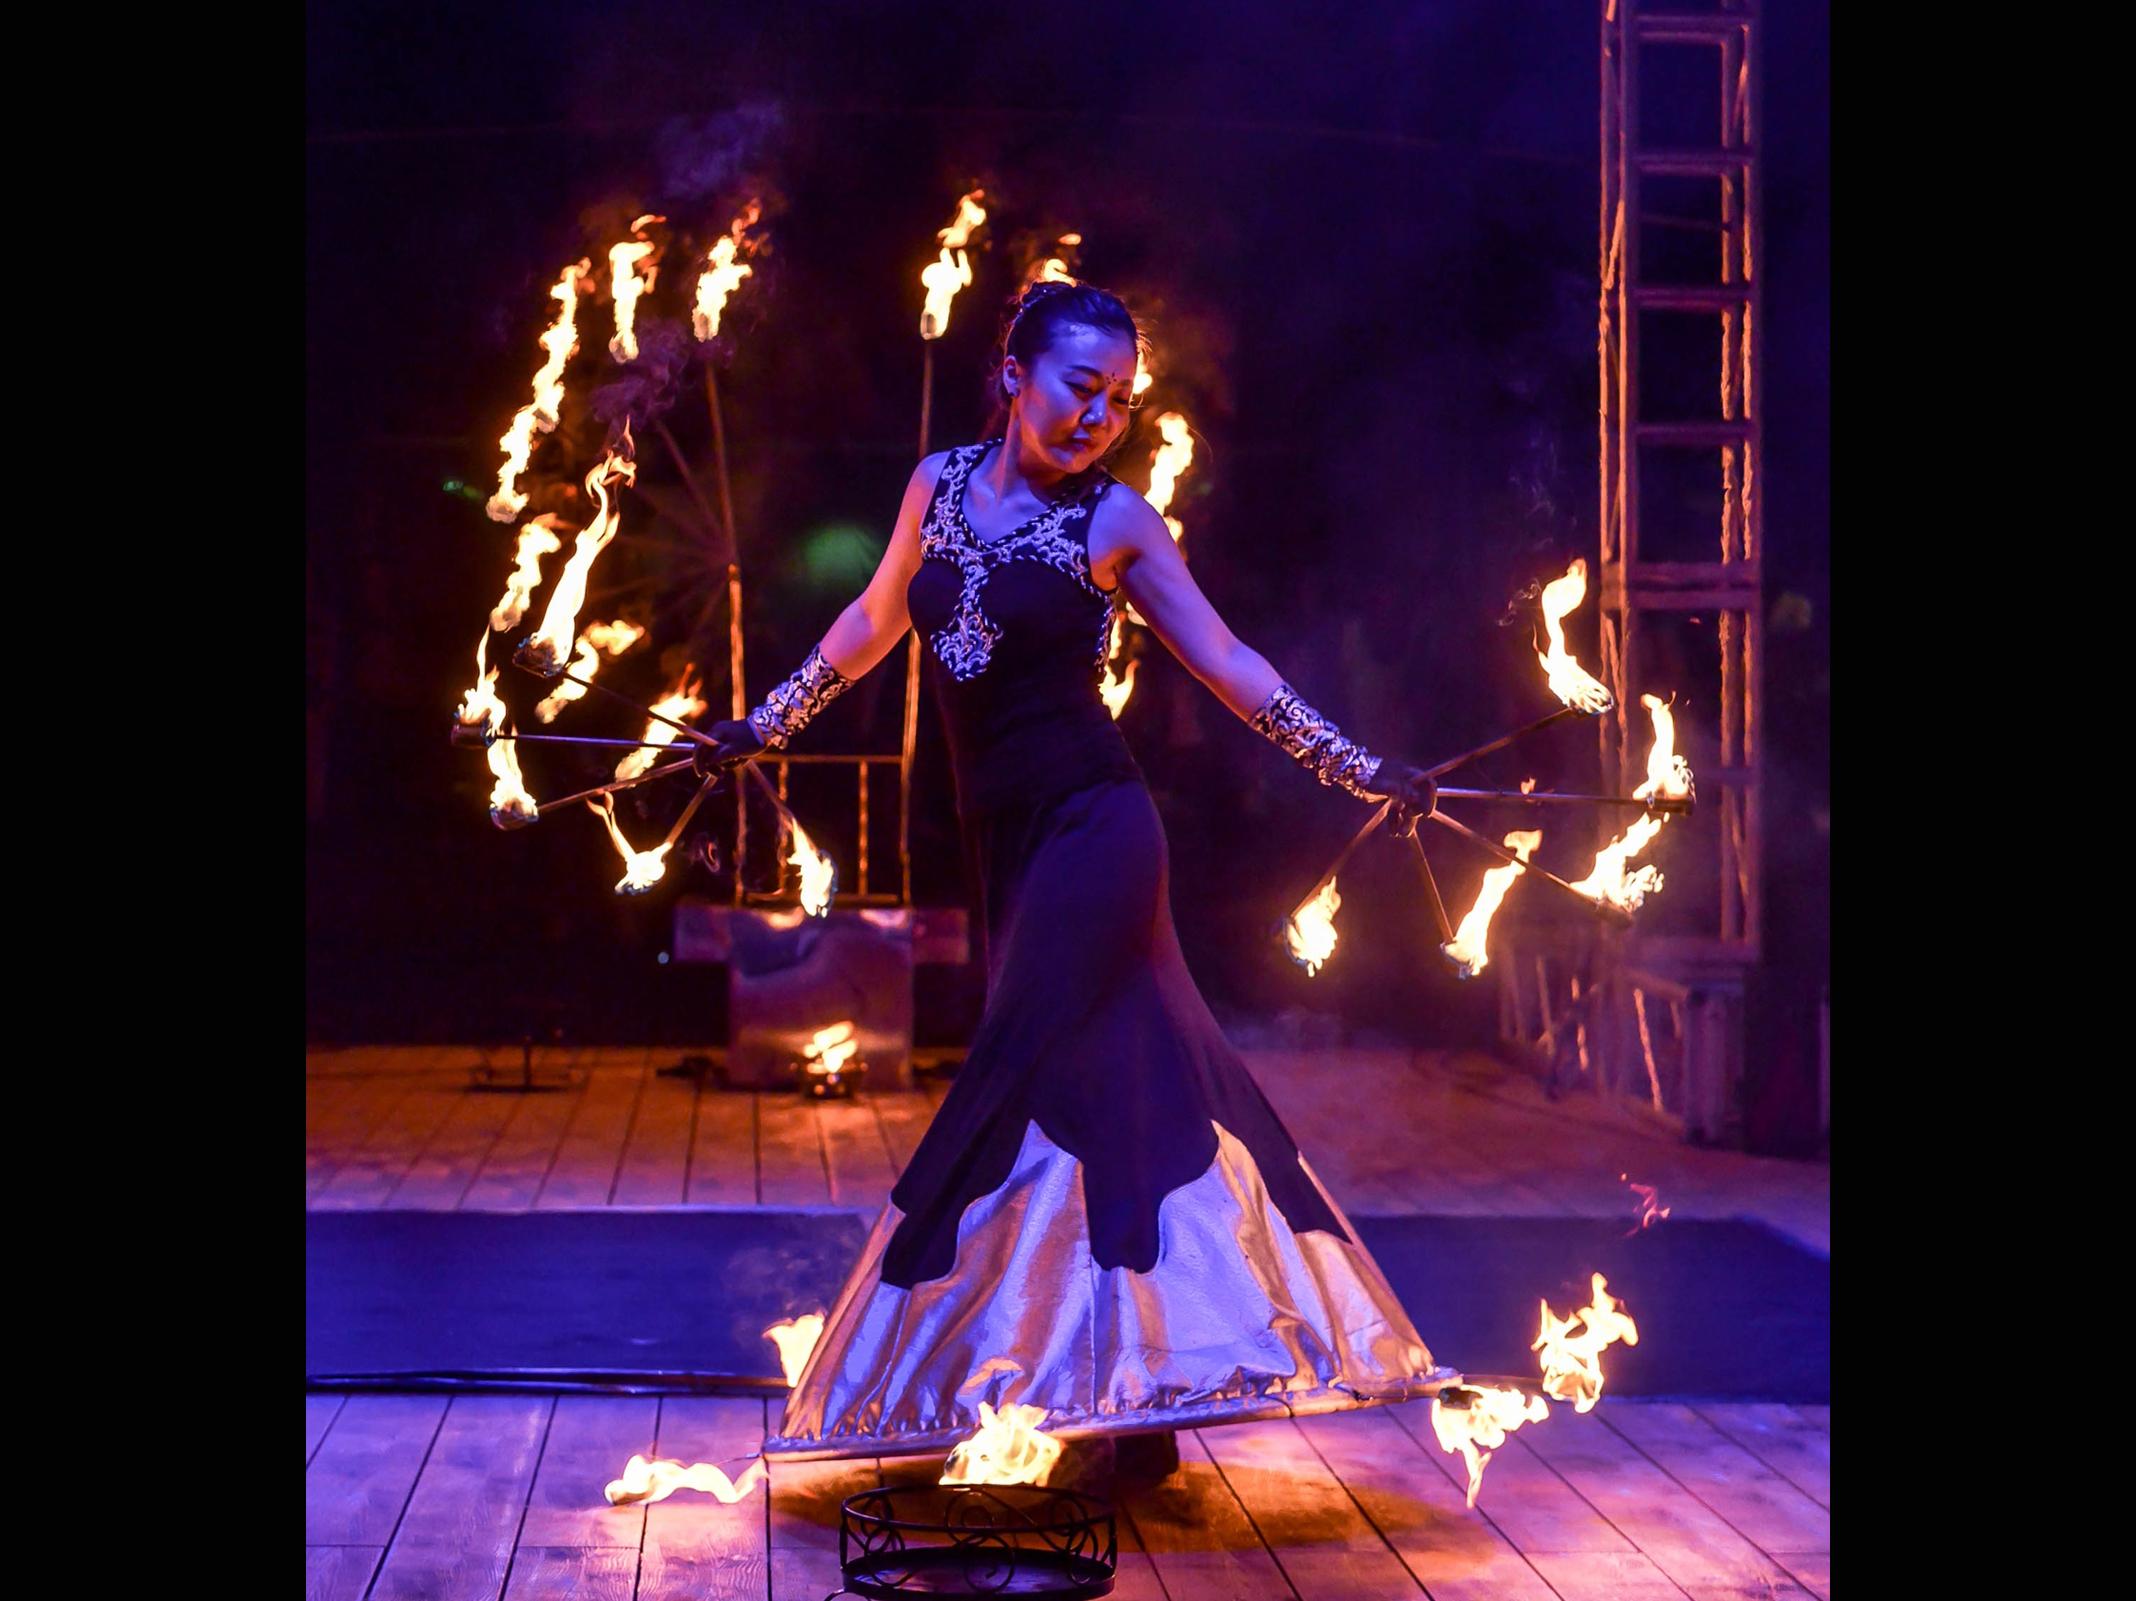 Fire Arts_Flaming Fire team_yoony k  (5)